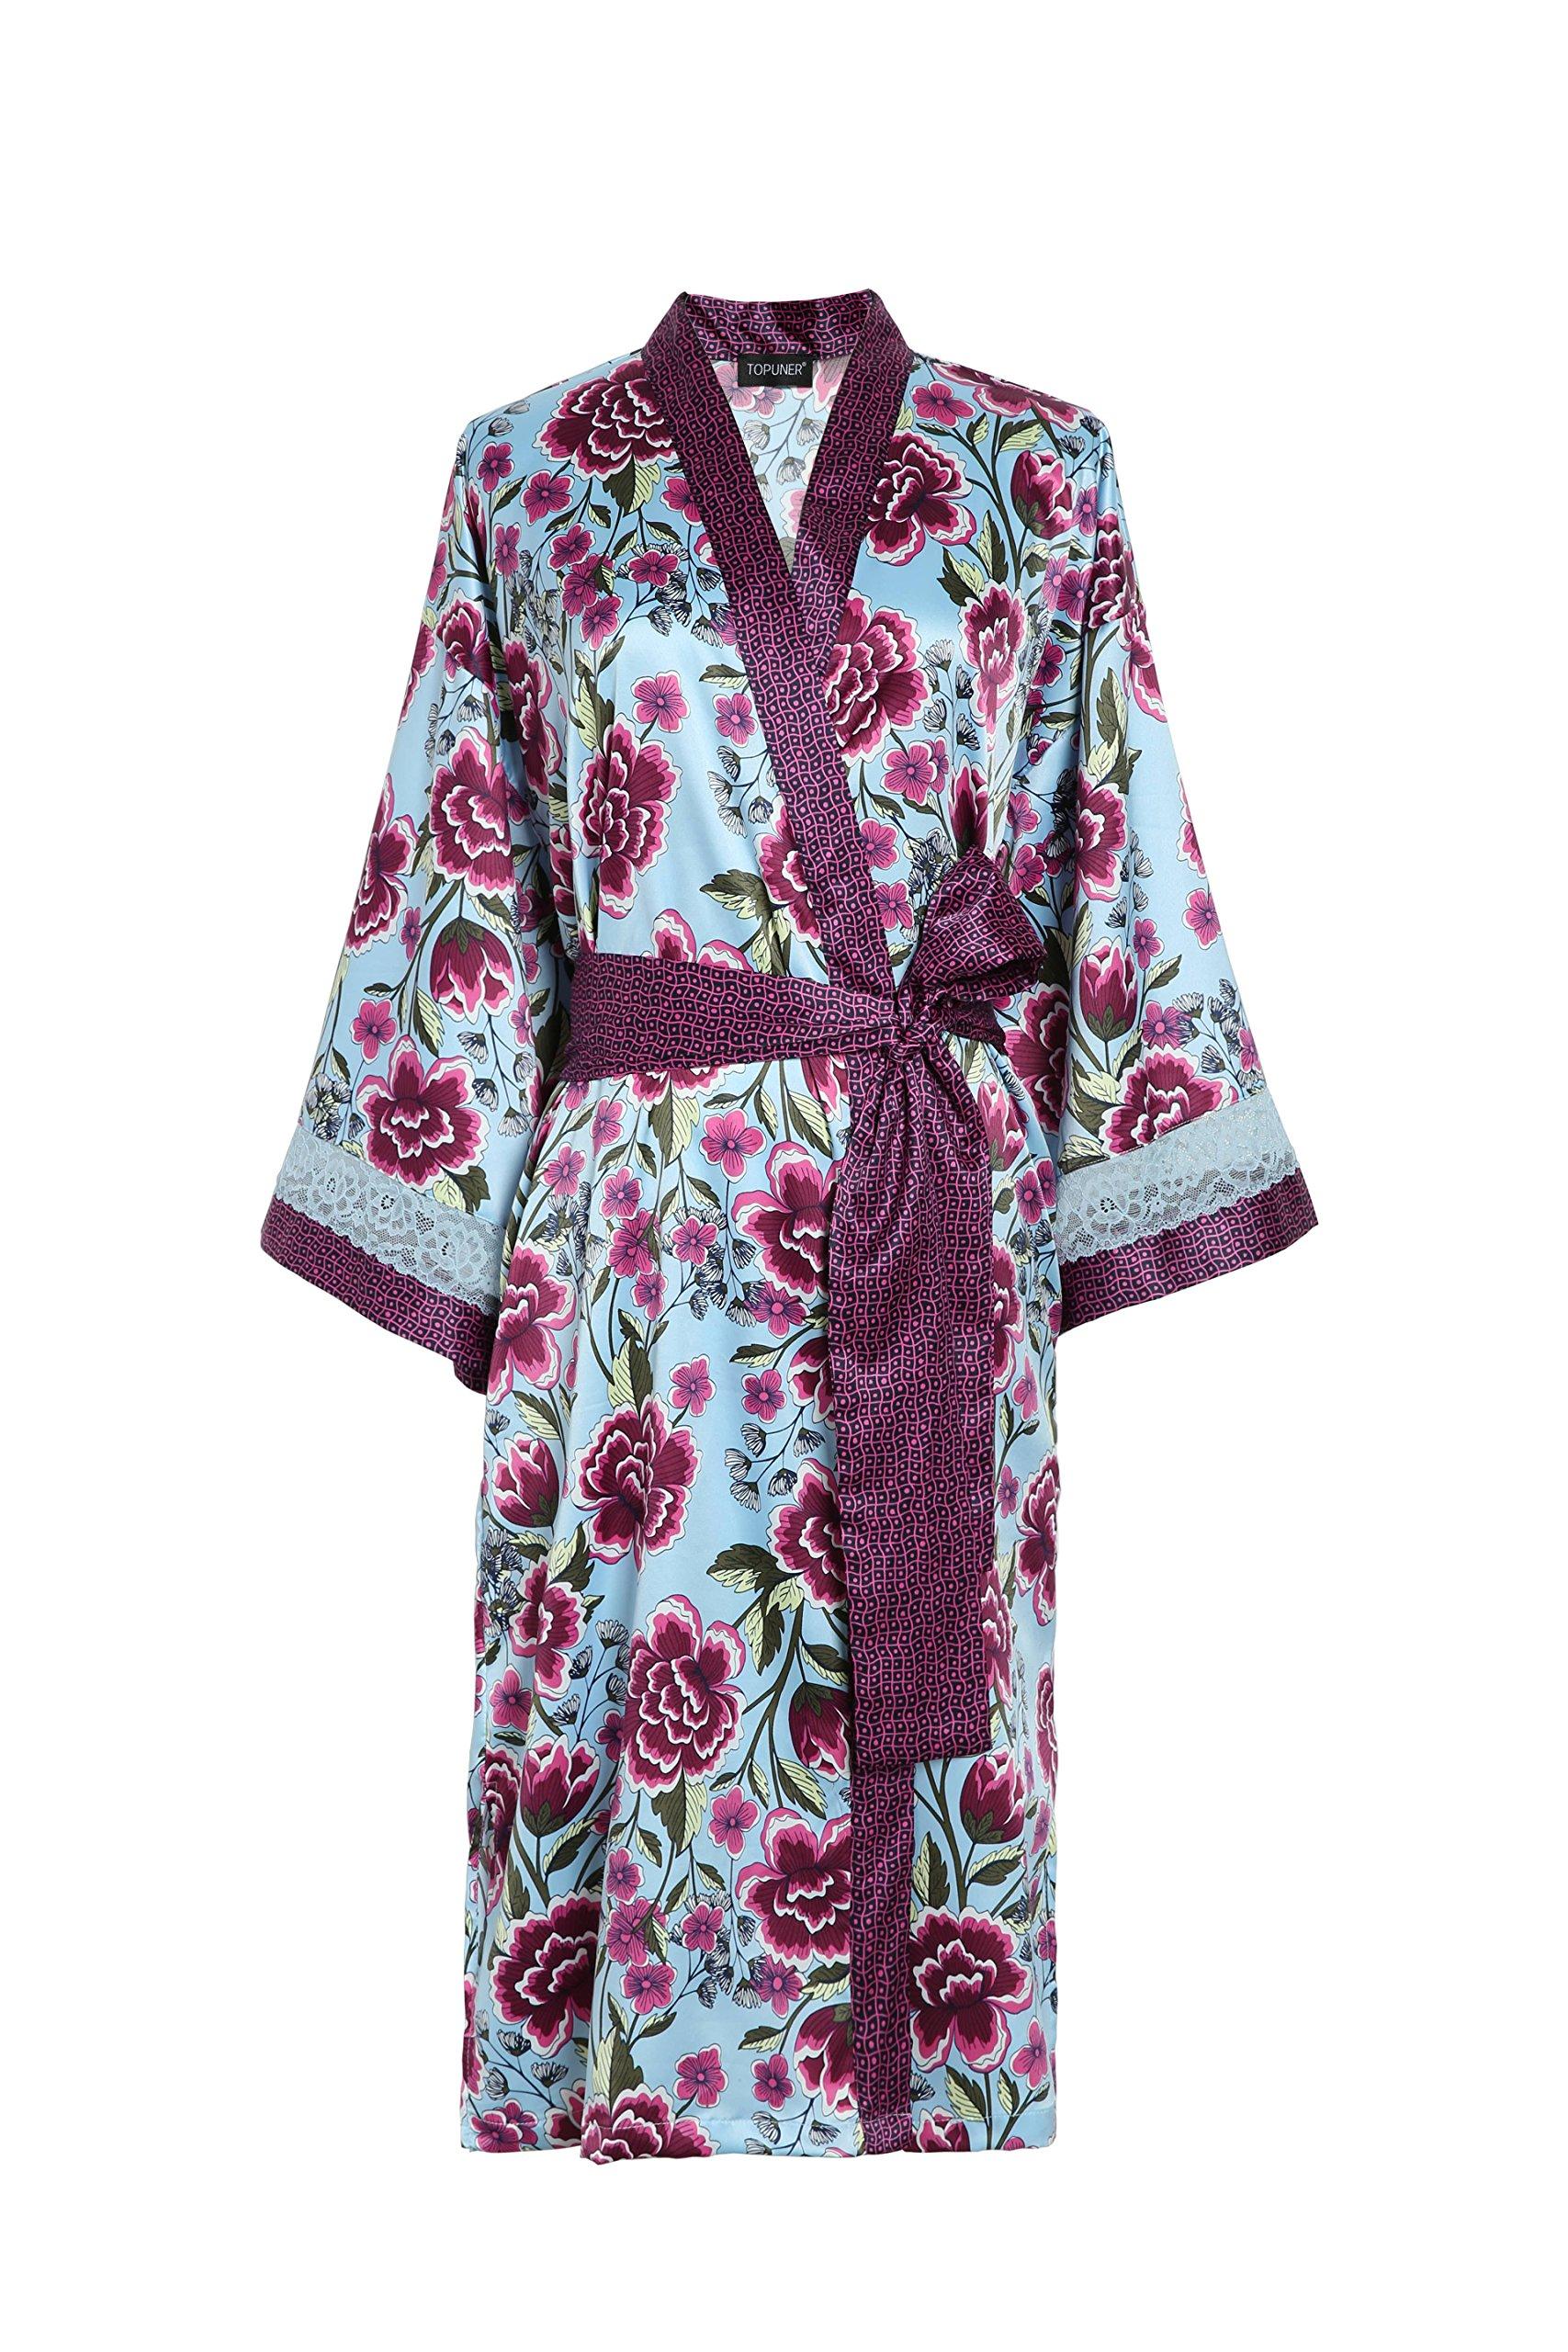 TOPUNER Womens' Summer Sleepwear Long Sleeves with Lace, Floral Print Silk Robe Kimono Bathrobe with Belt (S/M)